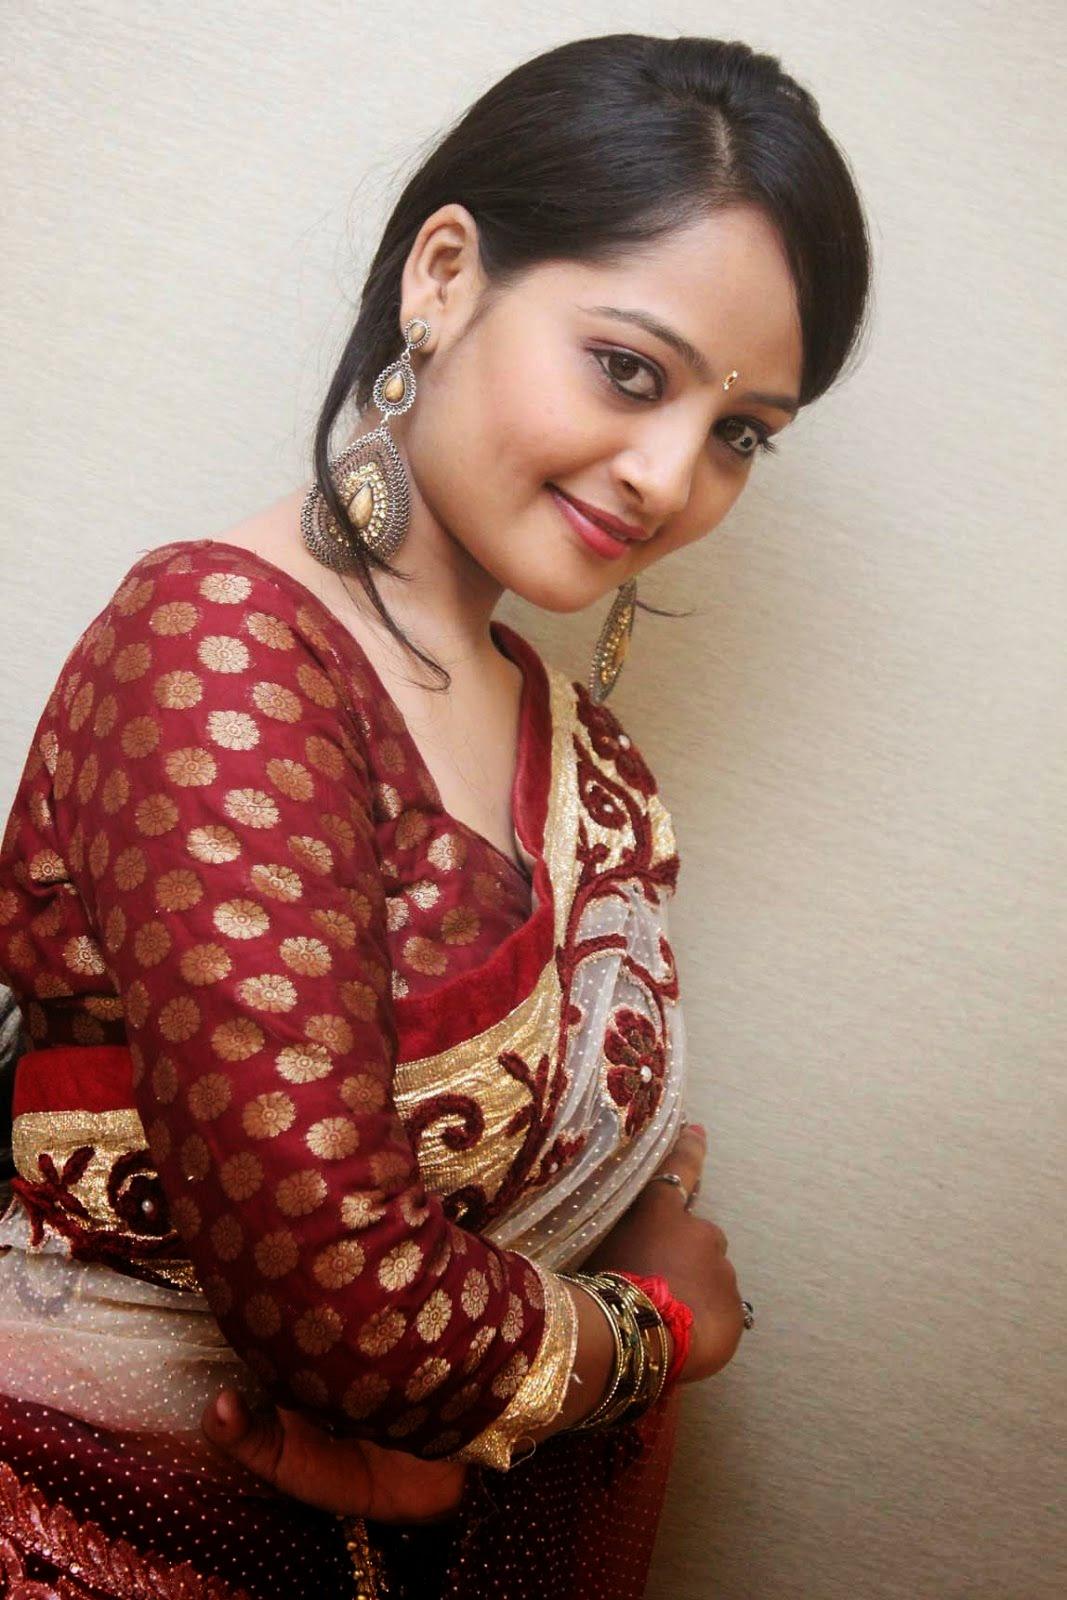 Tollywood: Young South Indian actress Sindhuri